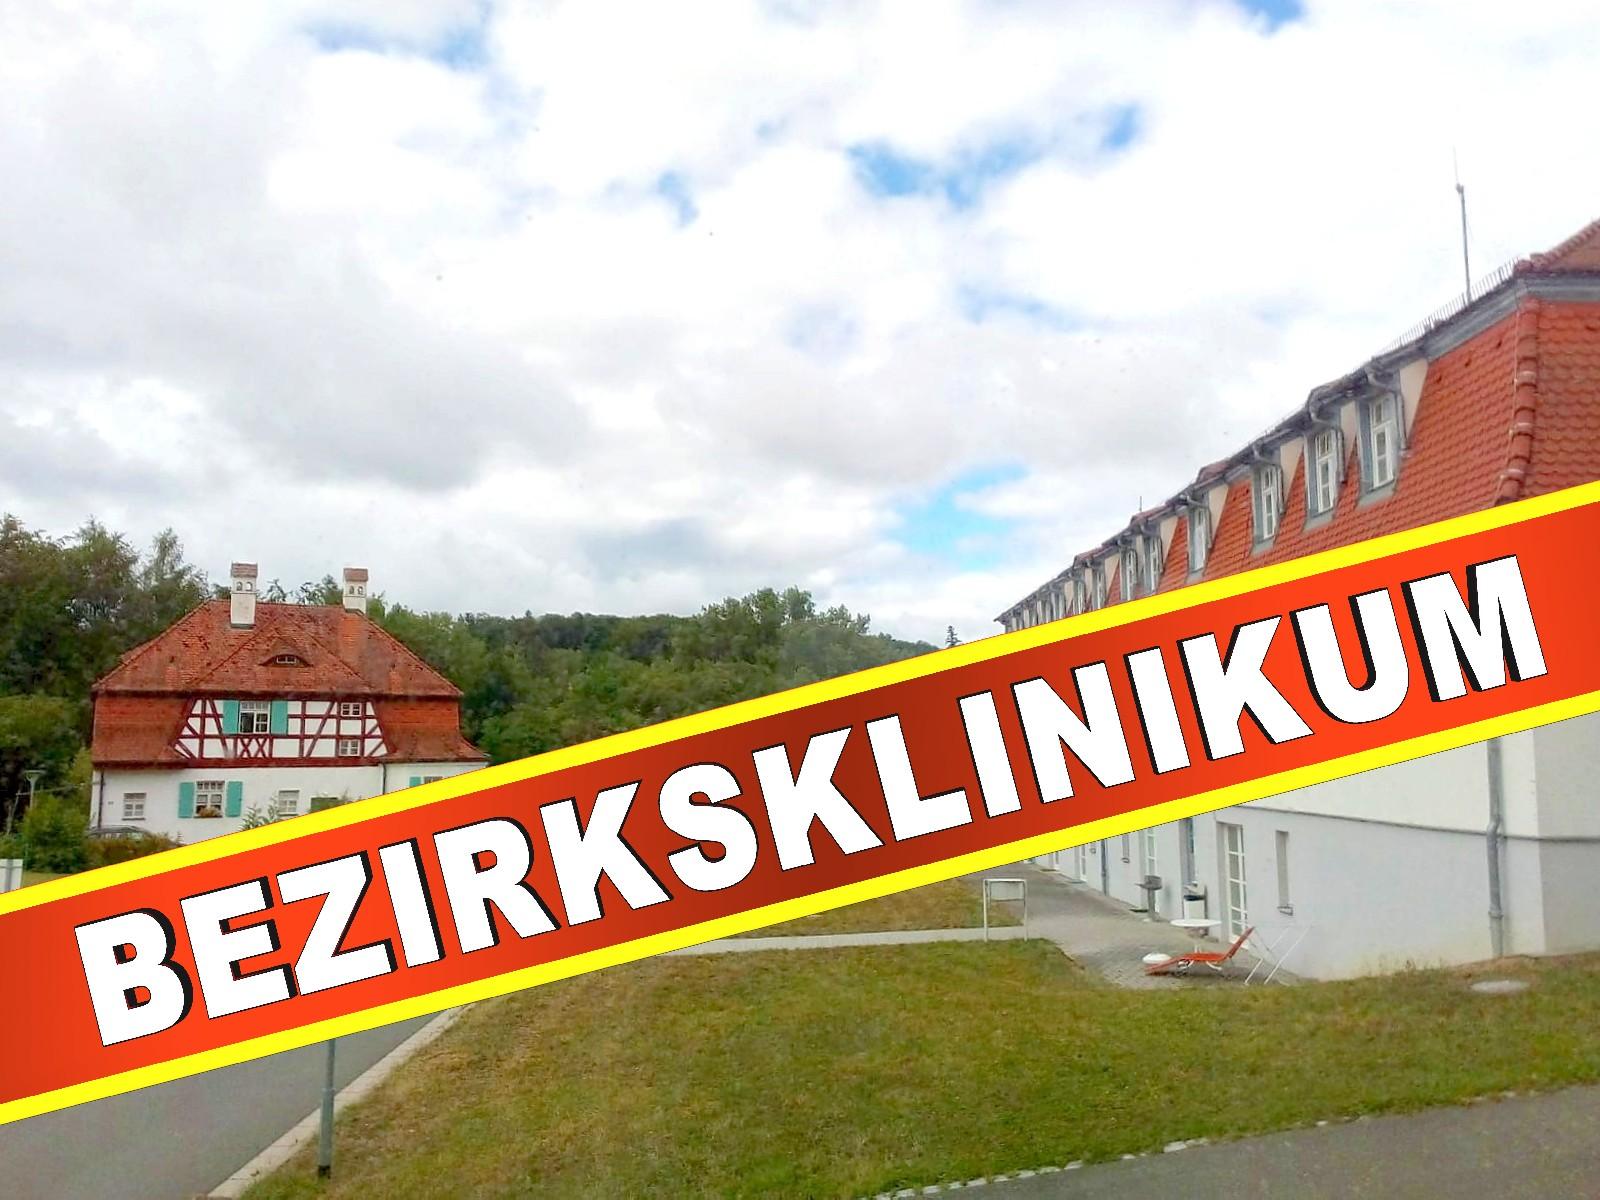 Bezirksklinikum Obermain Kutzenberg, 96250 Ebensfeld Psychiatrie Polizei Krankenhaus (48)